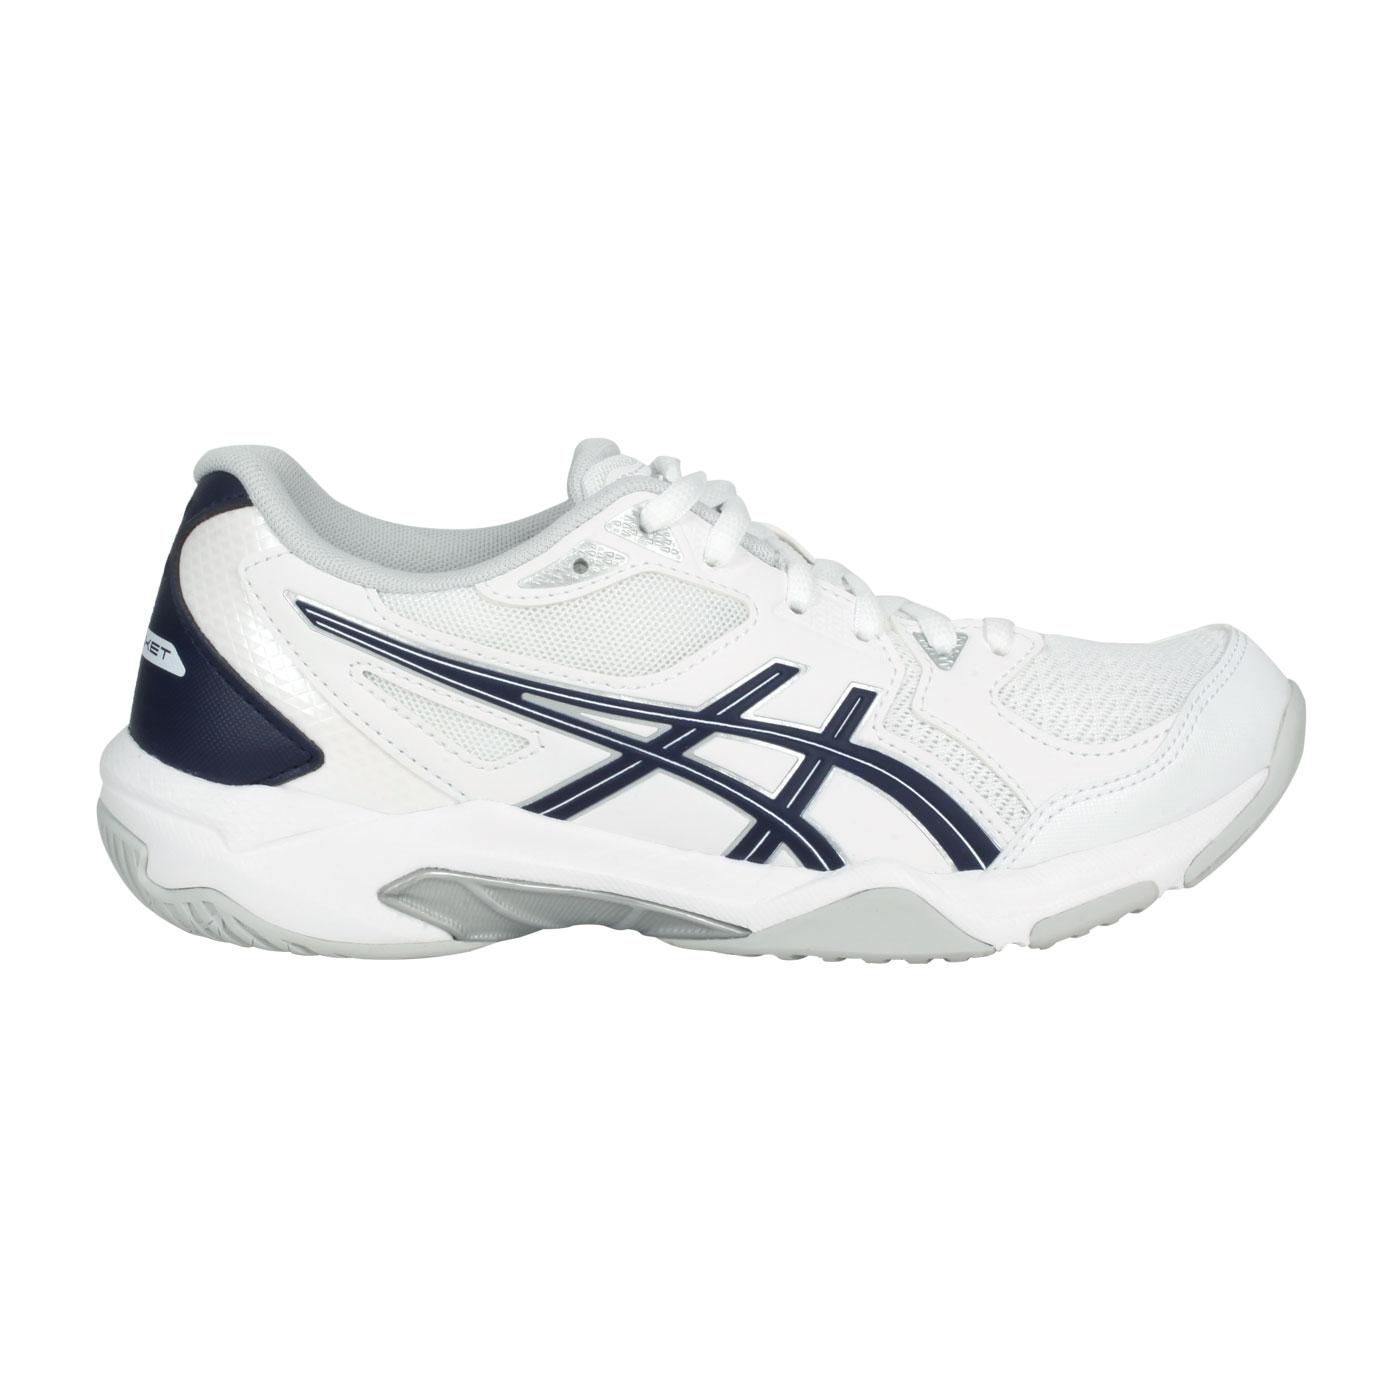 ASICS 女款排羽球鞋  @GEL-ROCKET 10@1072A056-101